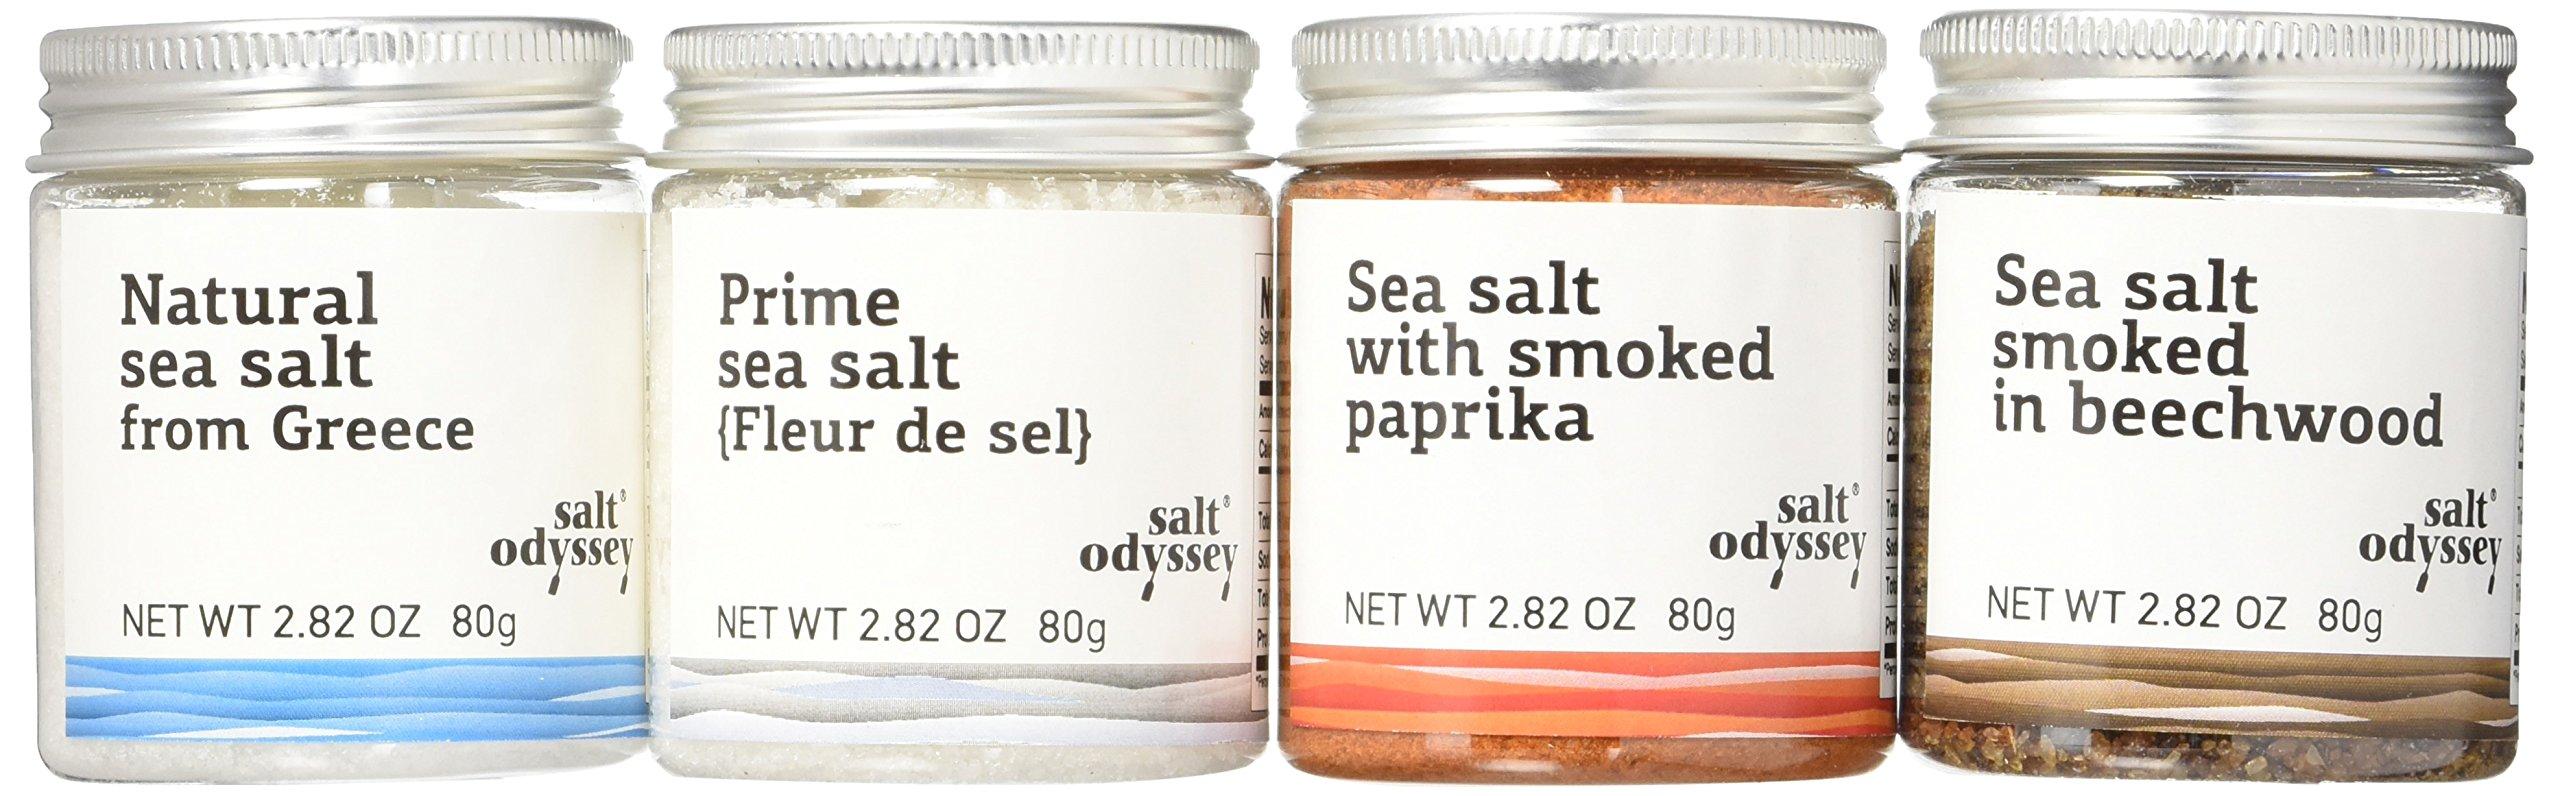 SALT ODYSSEY Four Piece A Journey of Salts Pack,The Finest Greek Salts, 320 Gram